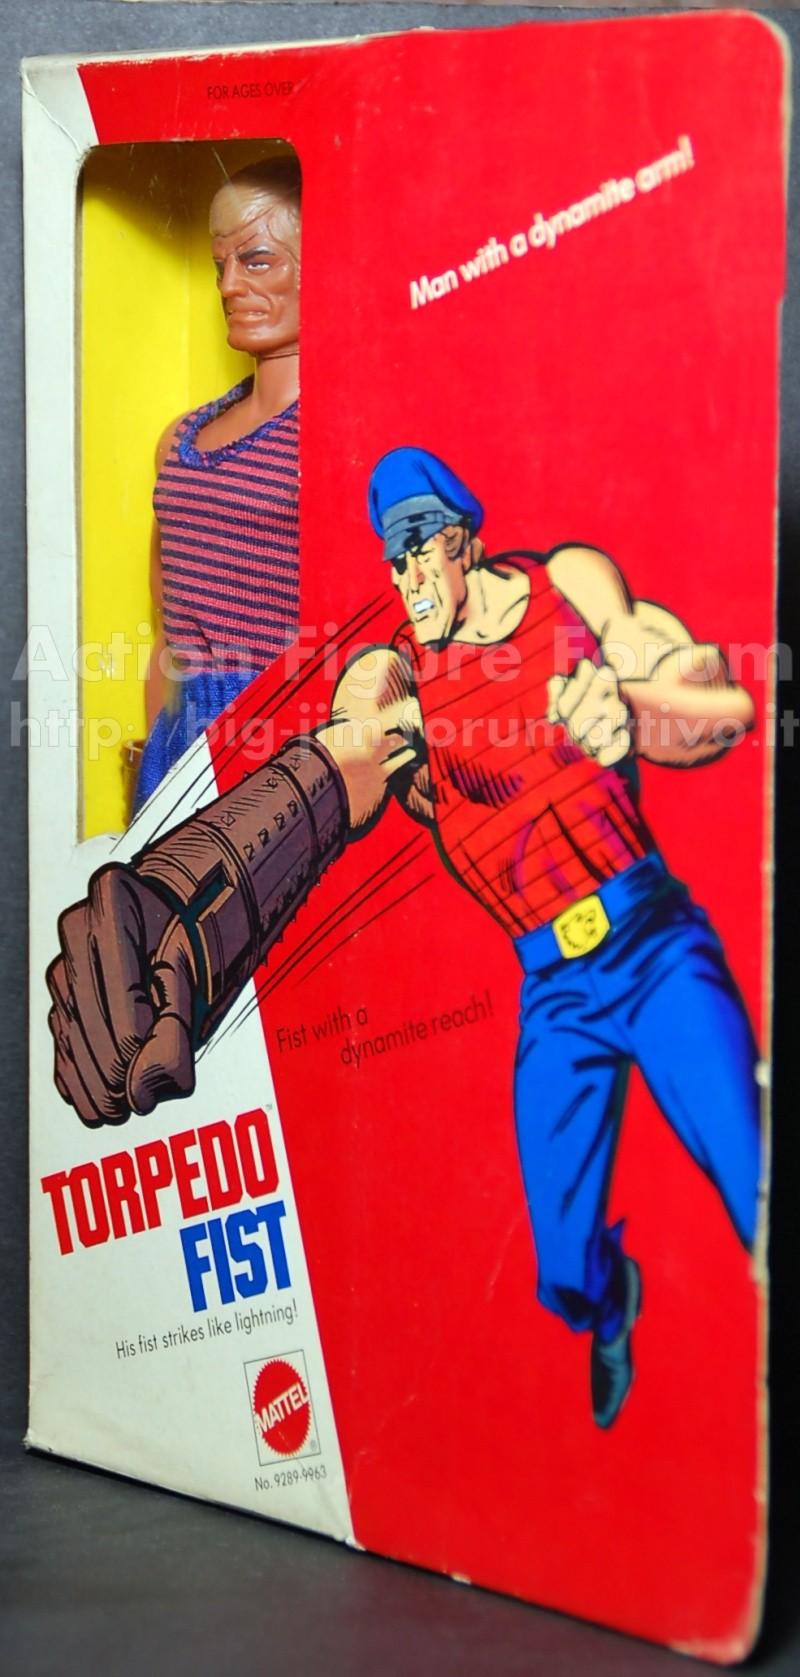 "TORPEDO FIST "" Man with a dynamite arm"" No. 9289 /9963 Torped11"